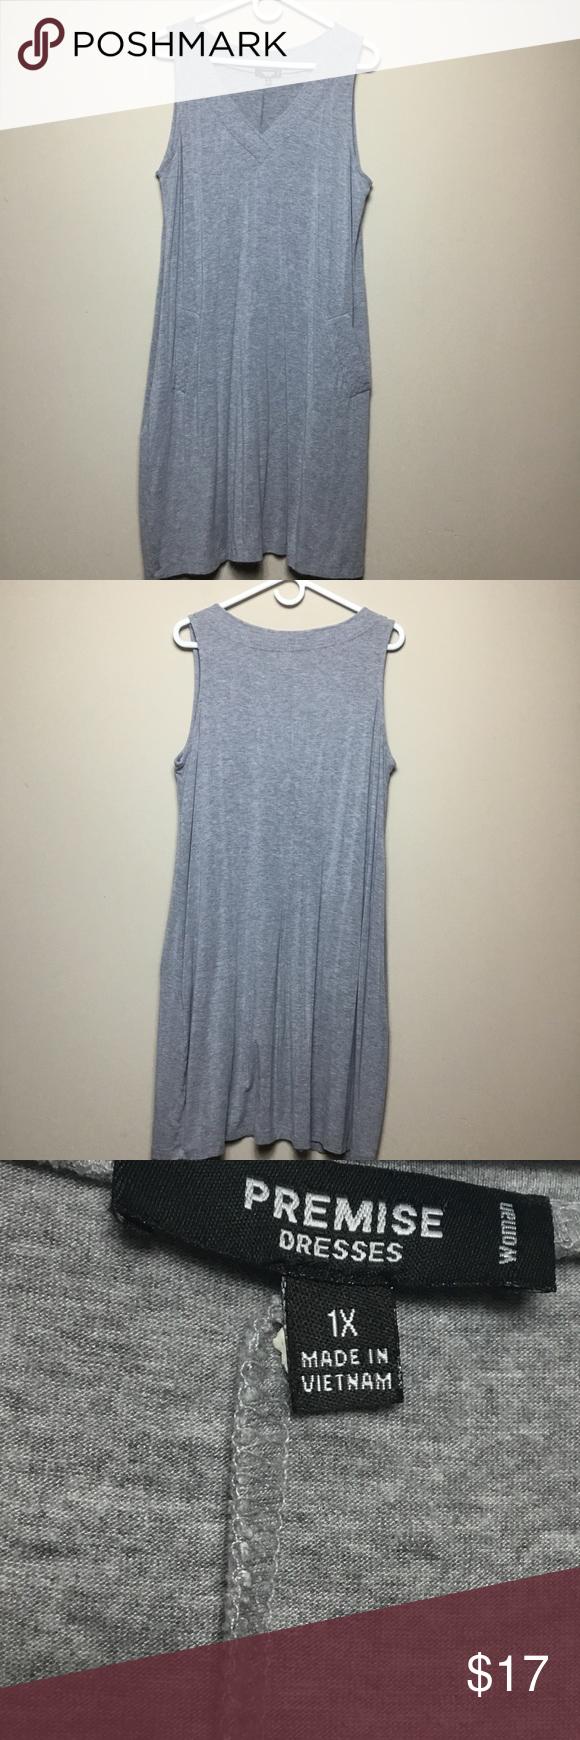 Gray Sleeveless Premise Plus Size Summer Dress Plus Size Summer Dresses Plus Size Summer Summer Dresses [ 1740 x 580 Pixel ]